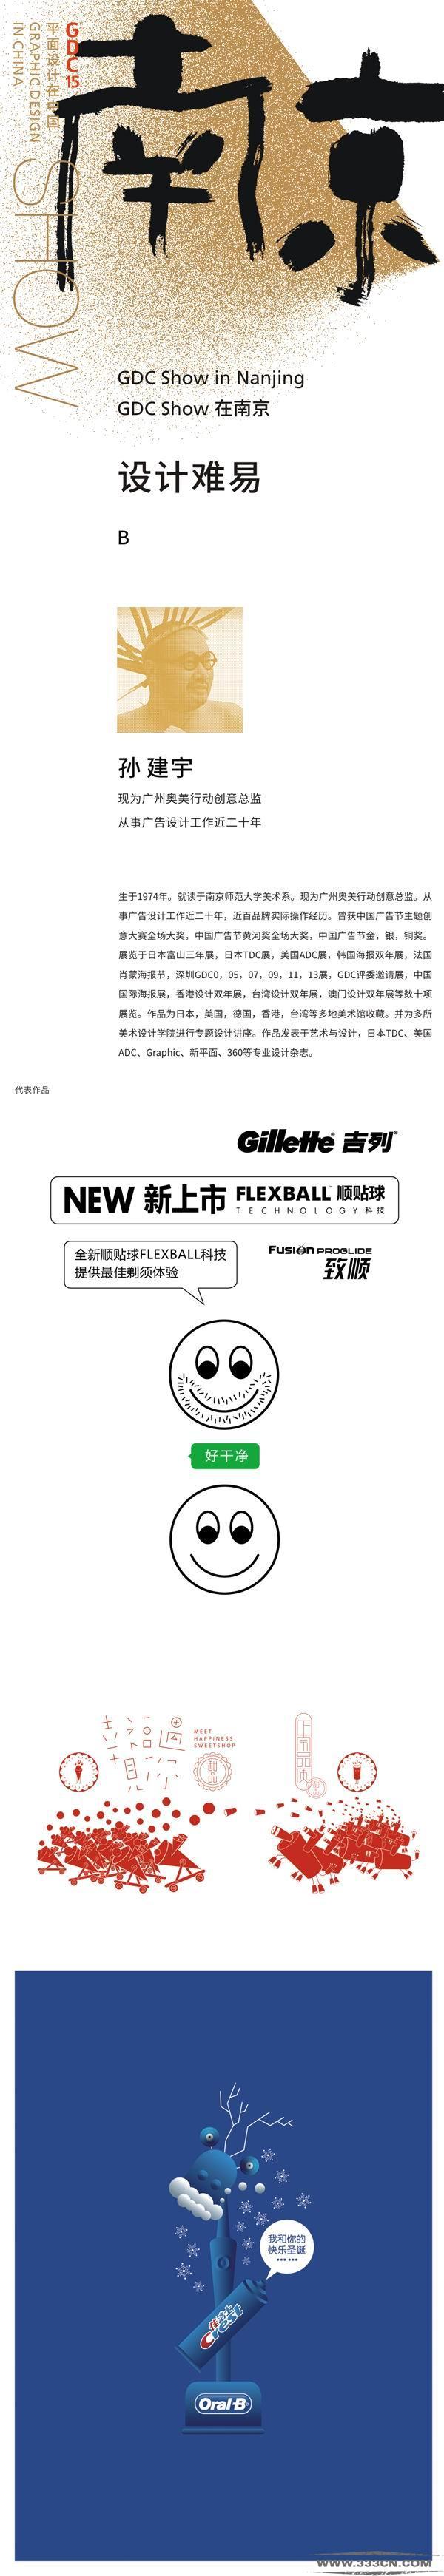 GDC Show 在南京 设计难易 平面设计在中国